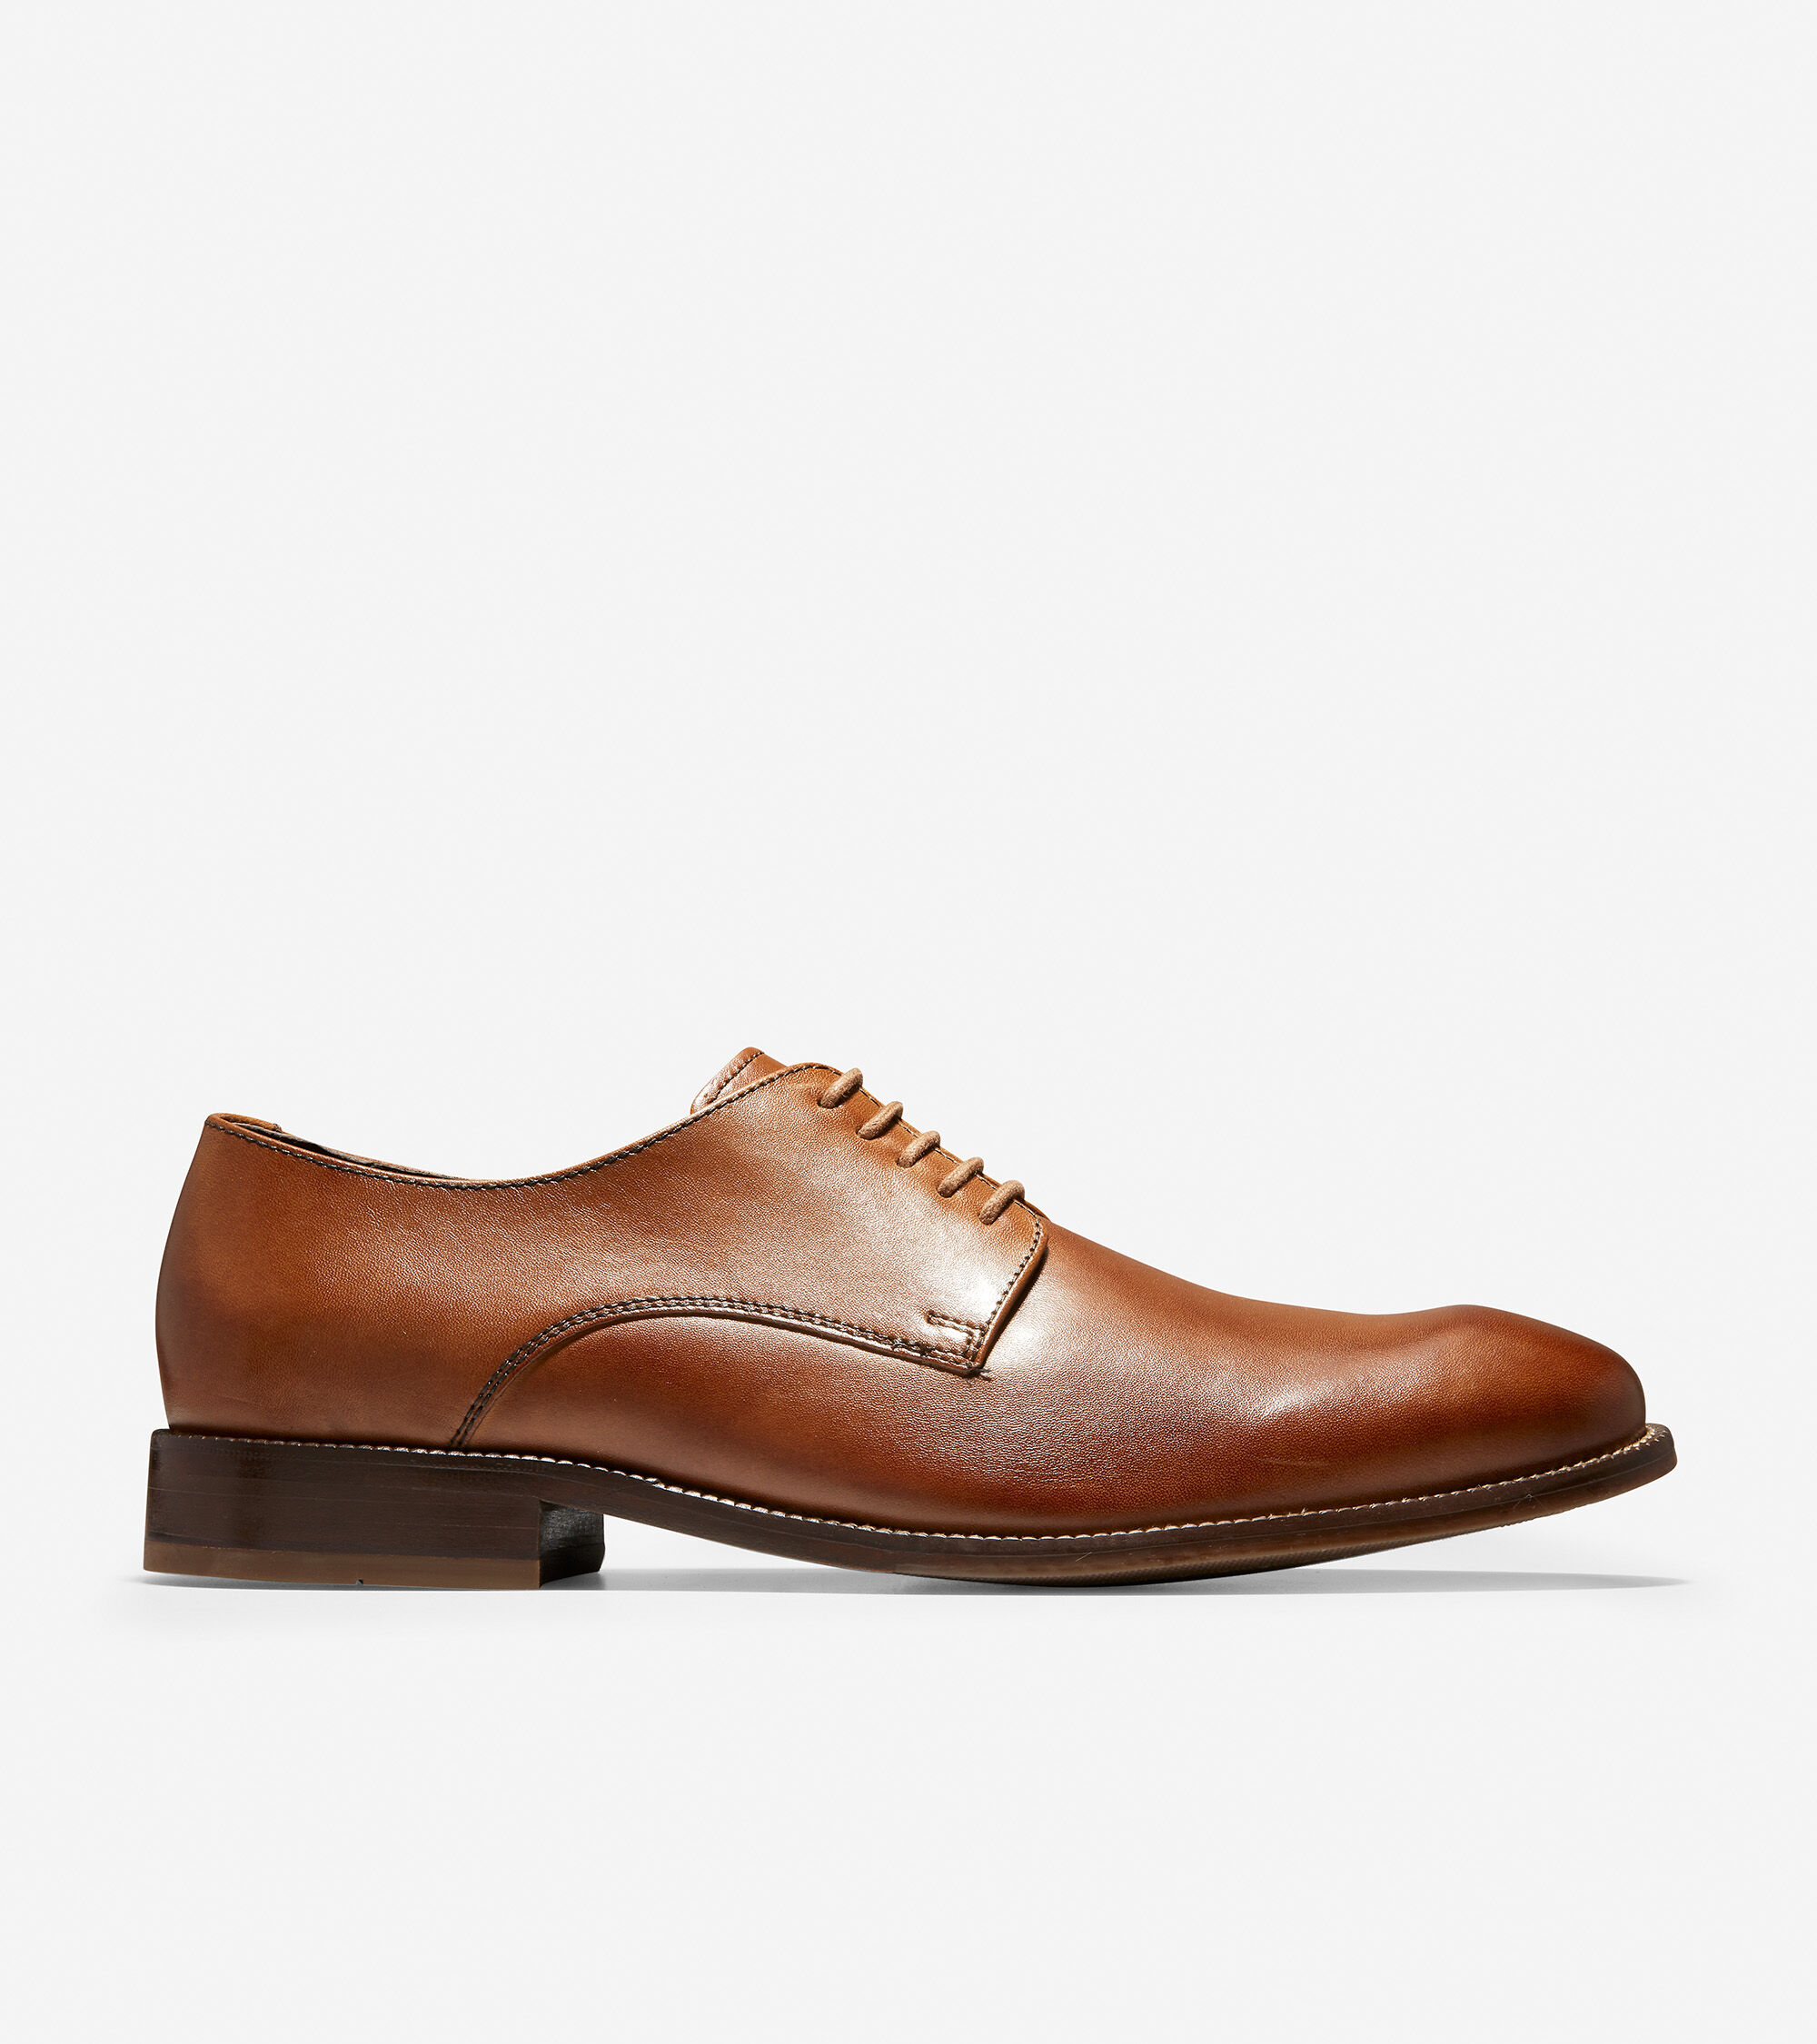 Men's Williams Plain Toe Oxford in